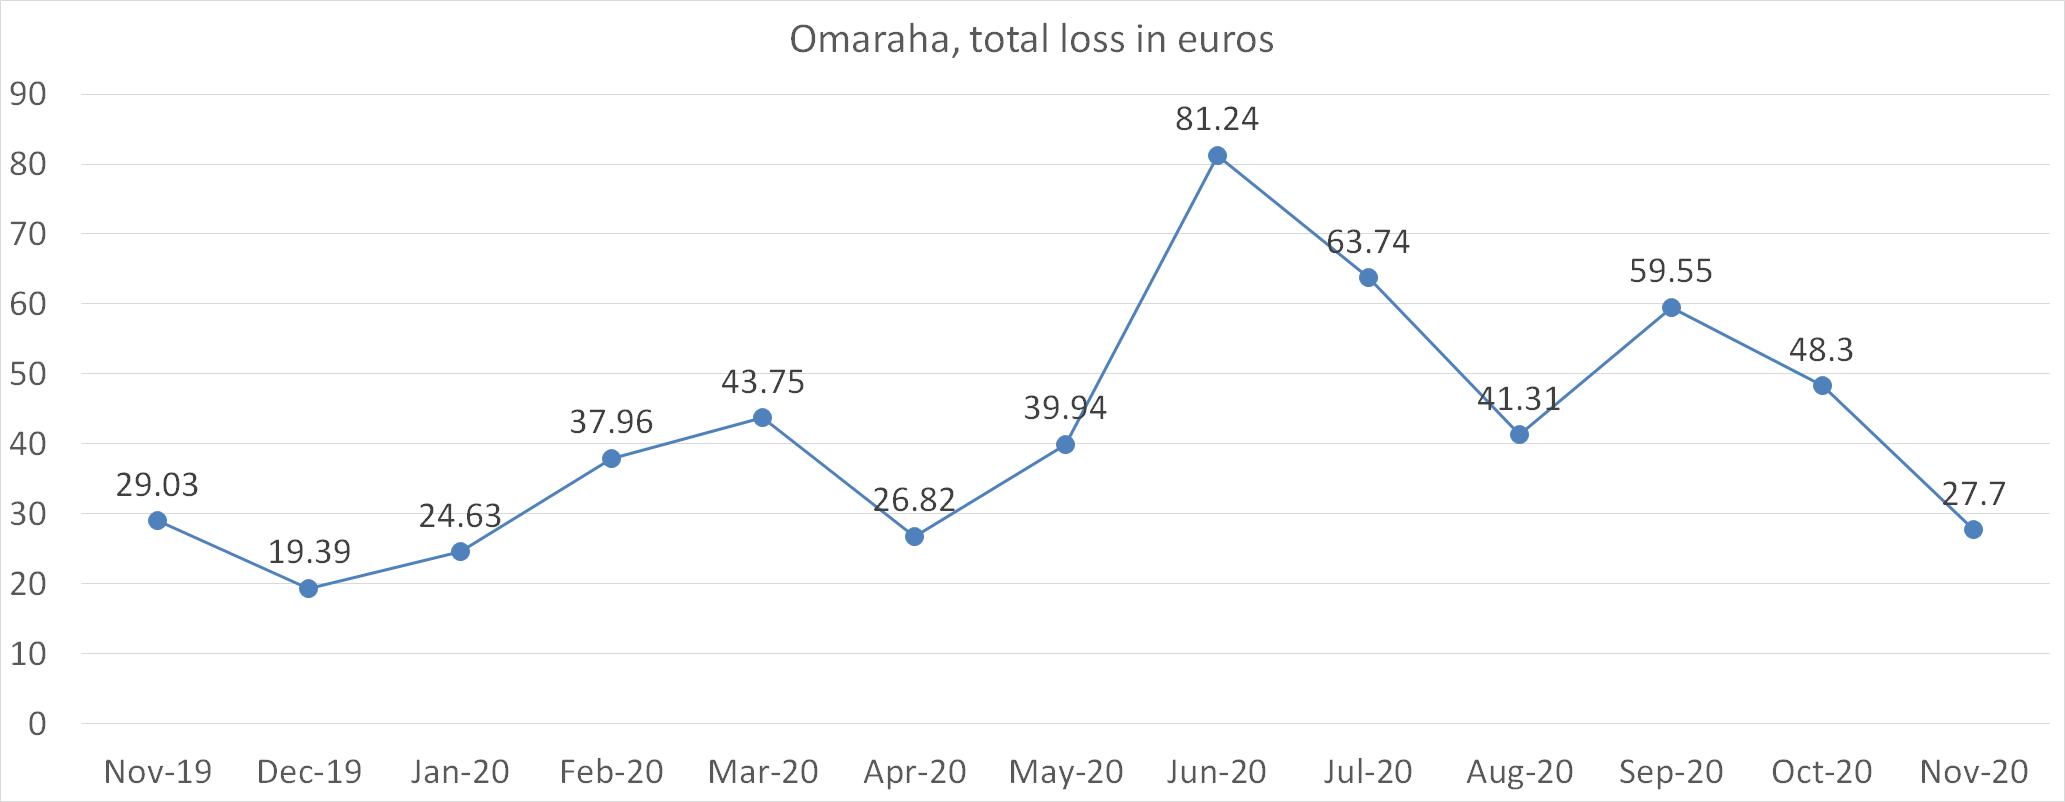 Omaraha, total loss in euros november 2020